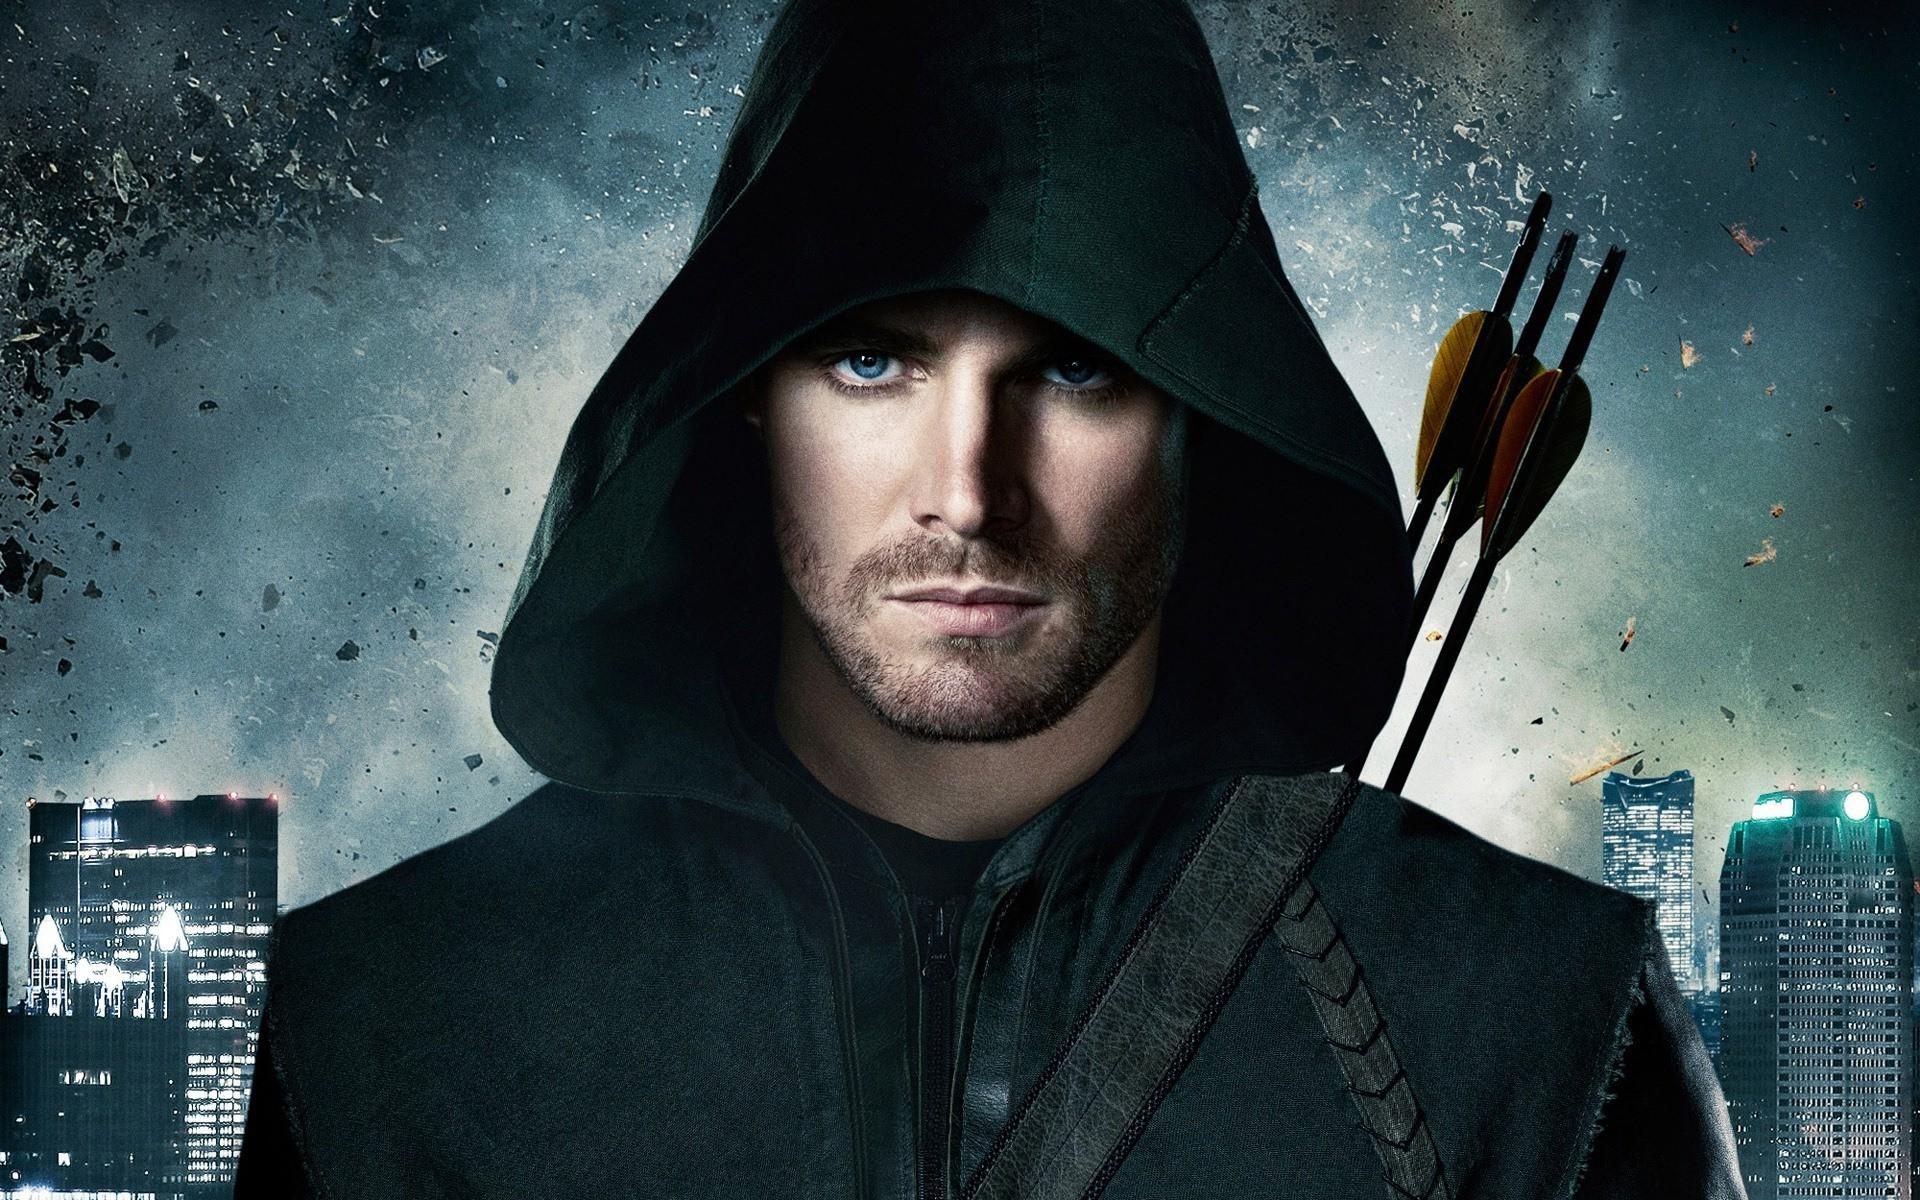 Popular Wallpaper Movie Arrow - Arrow-poster-Oliver-Queen-darkness-screenshot-1920x1200-px-album-cover-560128  Pic_773425.jpg